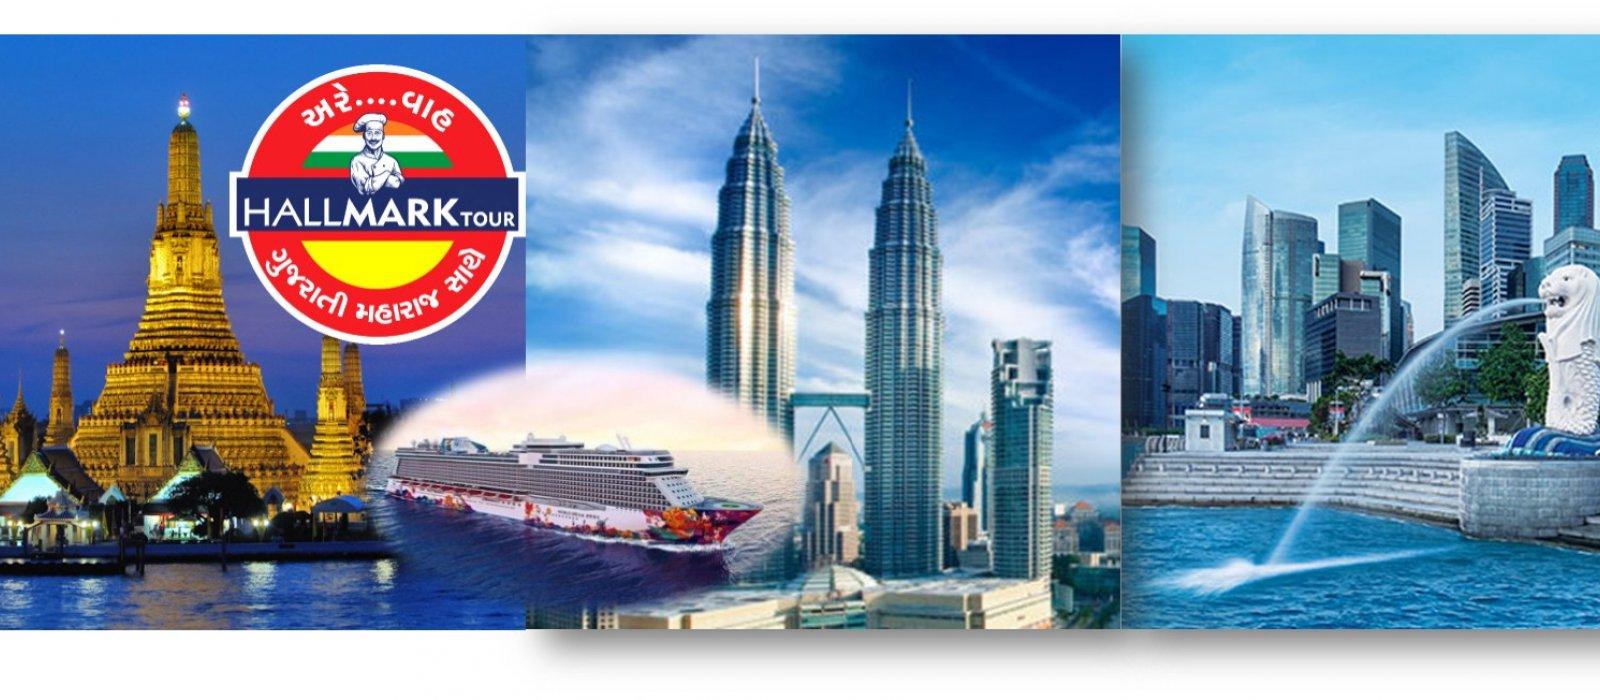 Far East & Dream Cruise with Maharaj